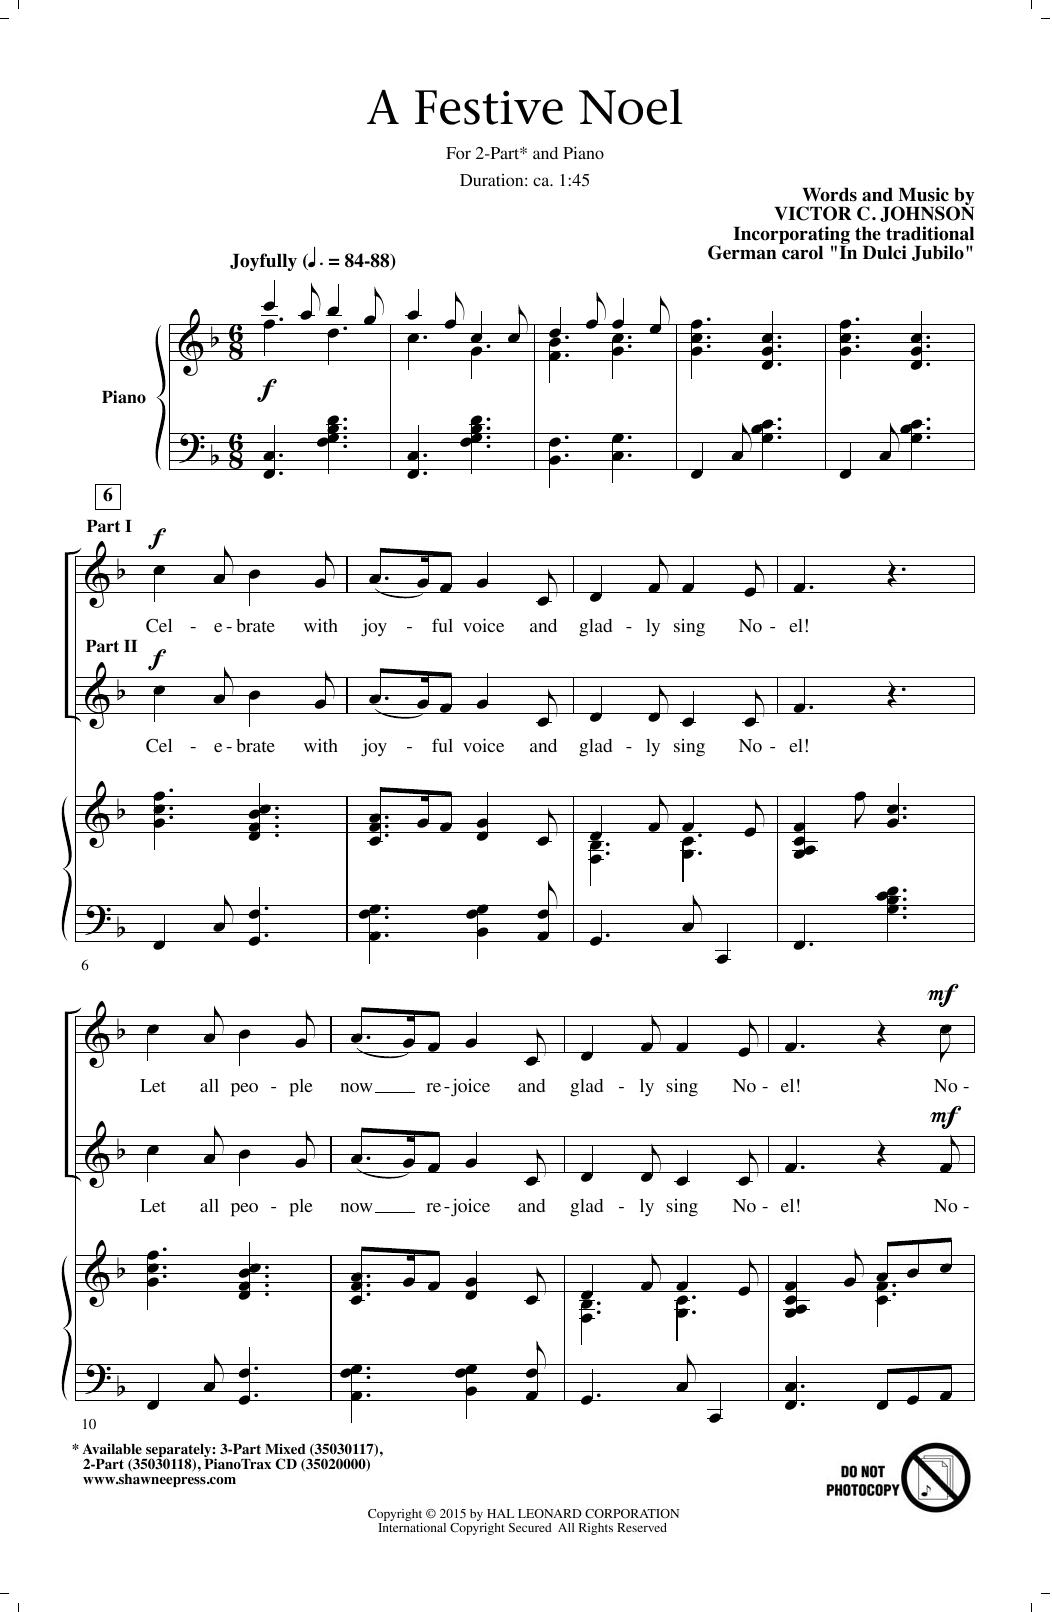 A Festive Noel Sheet Music